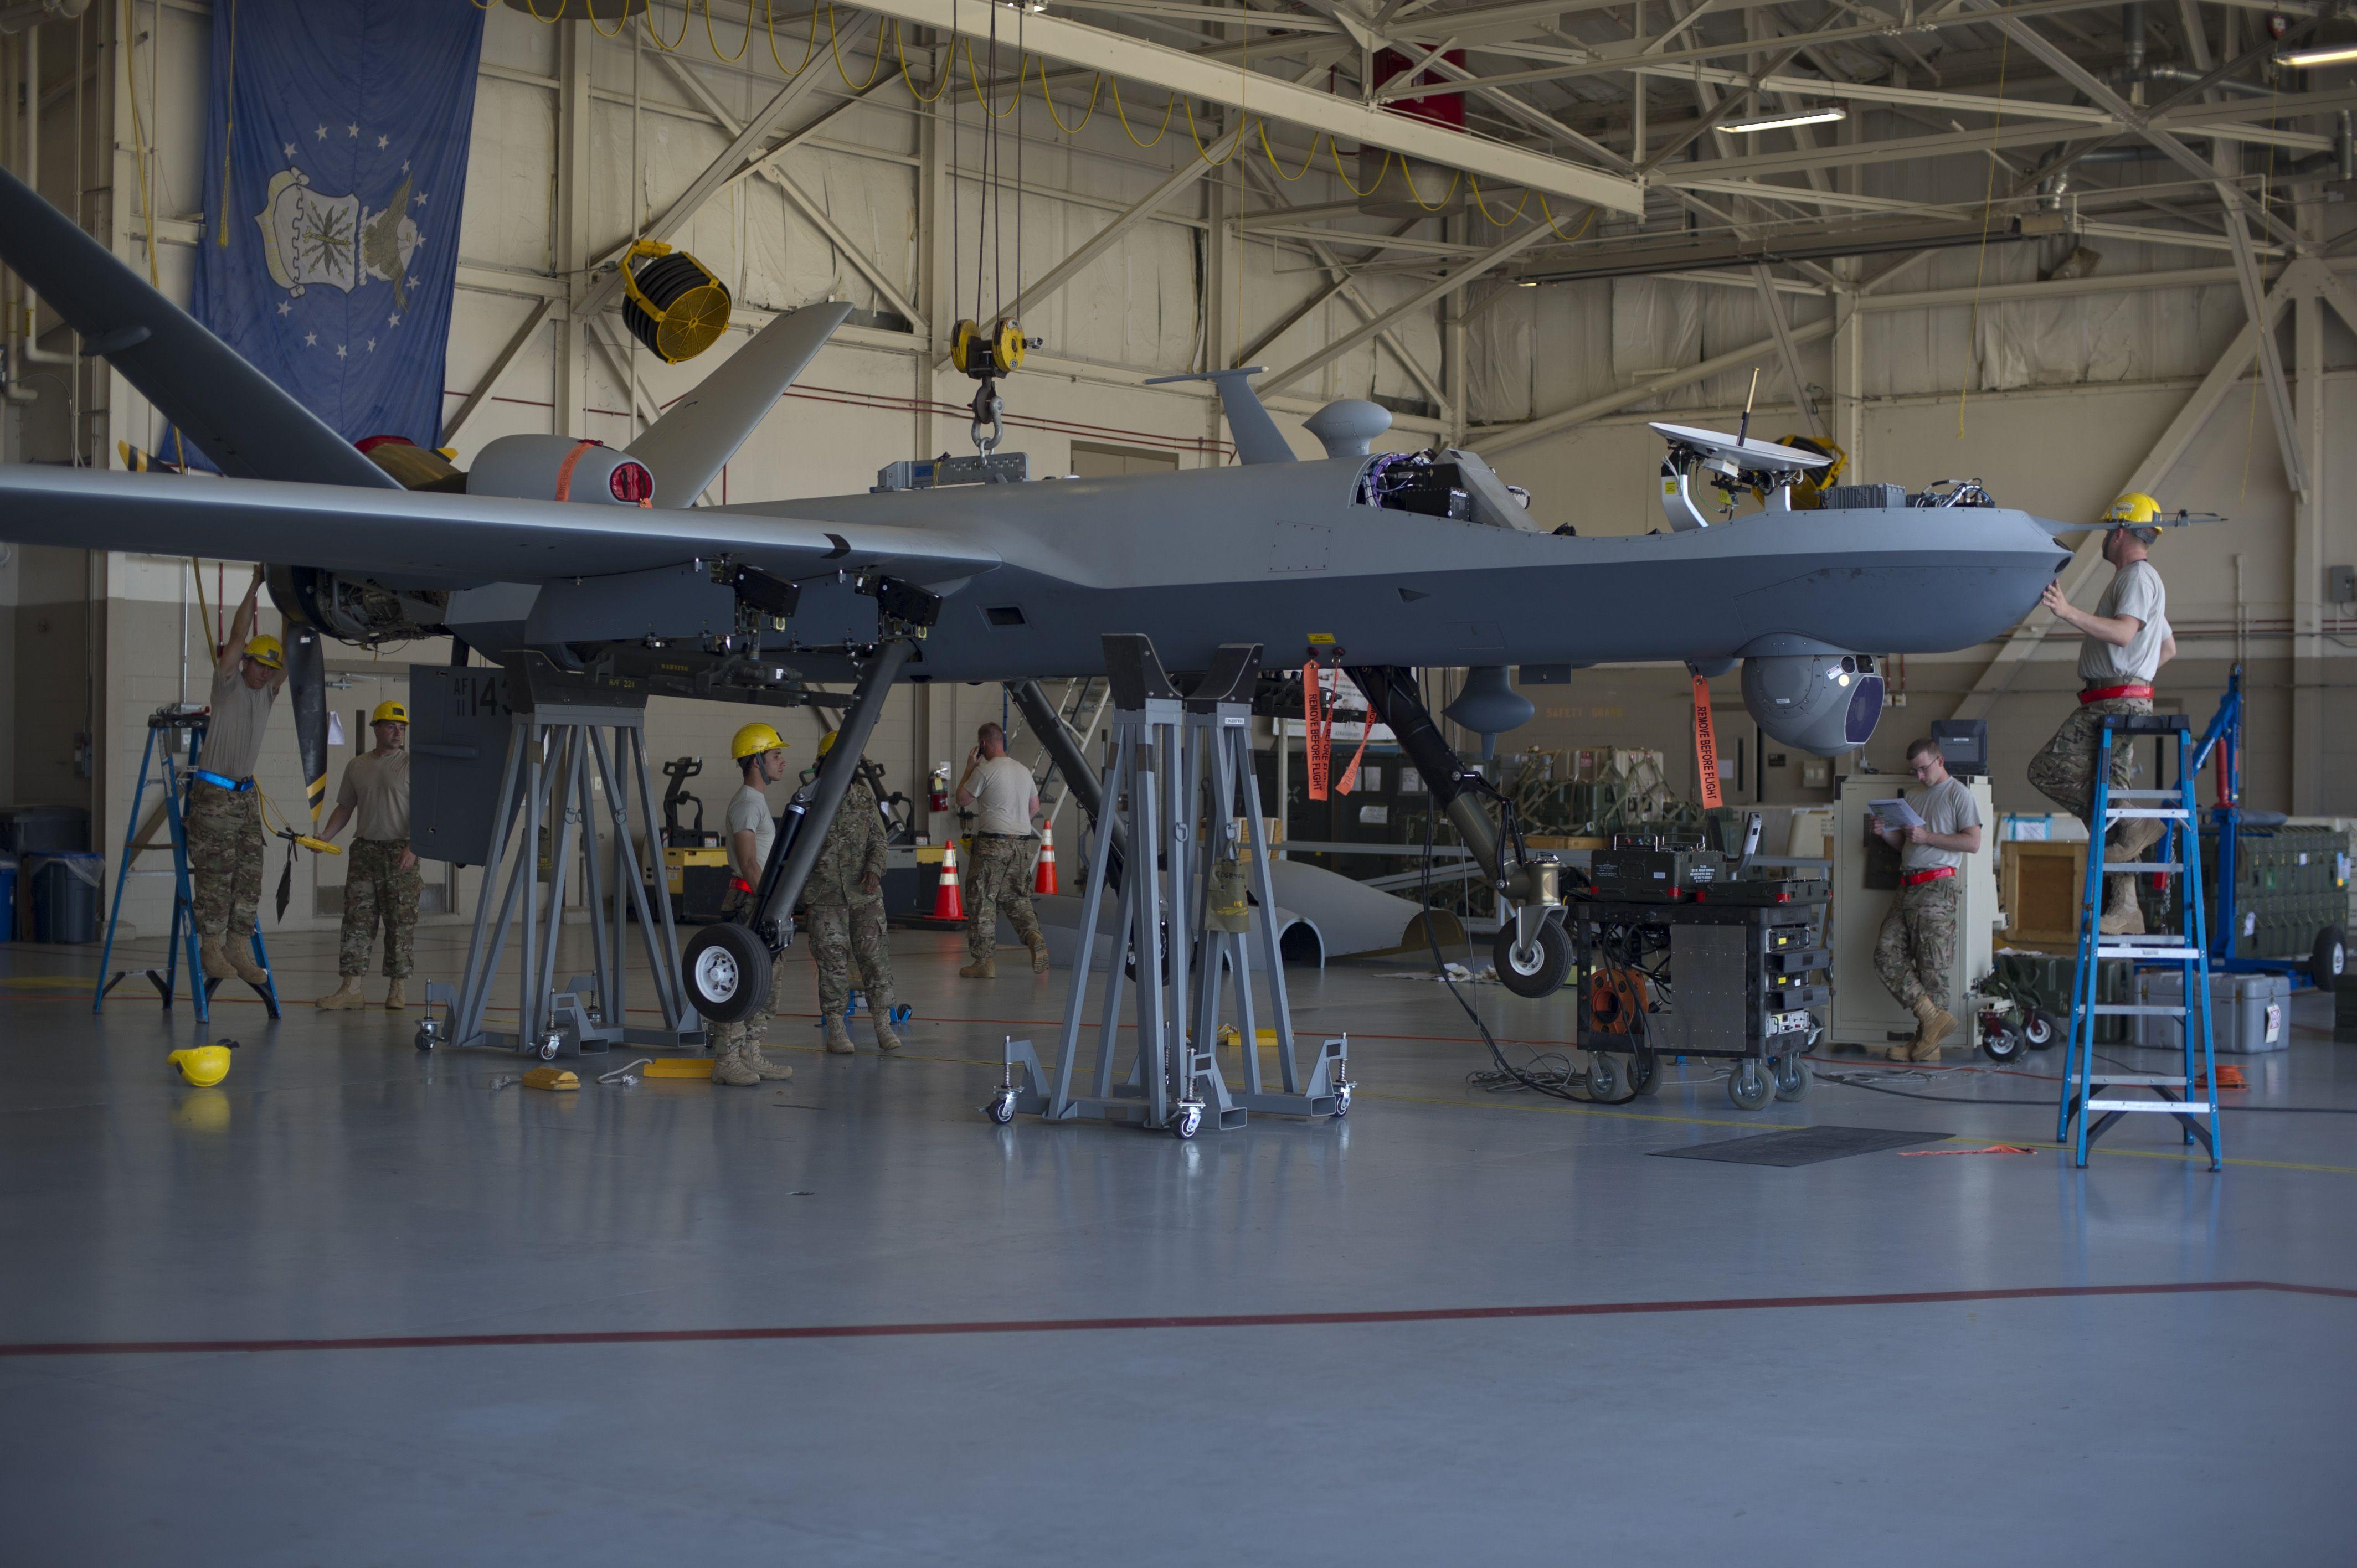 Airmen from Cannon Air Force Base assemble an MQ9 Reaper